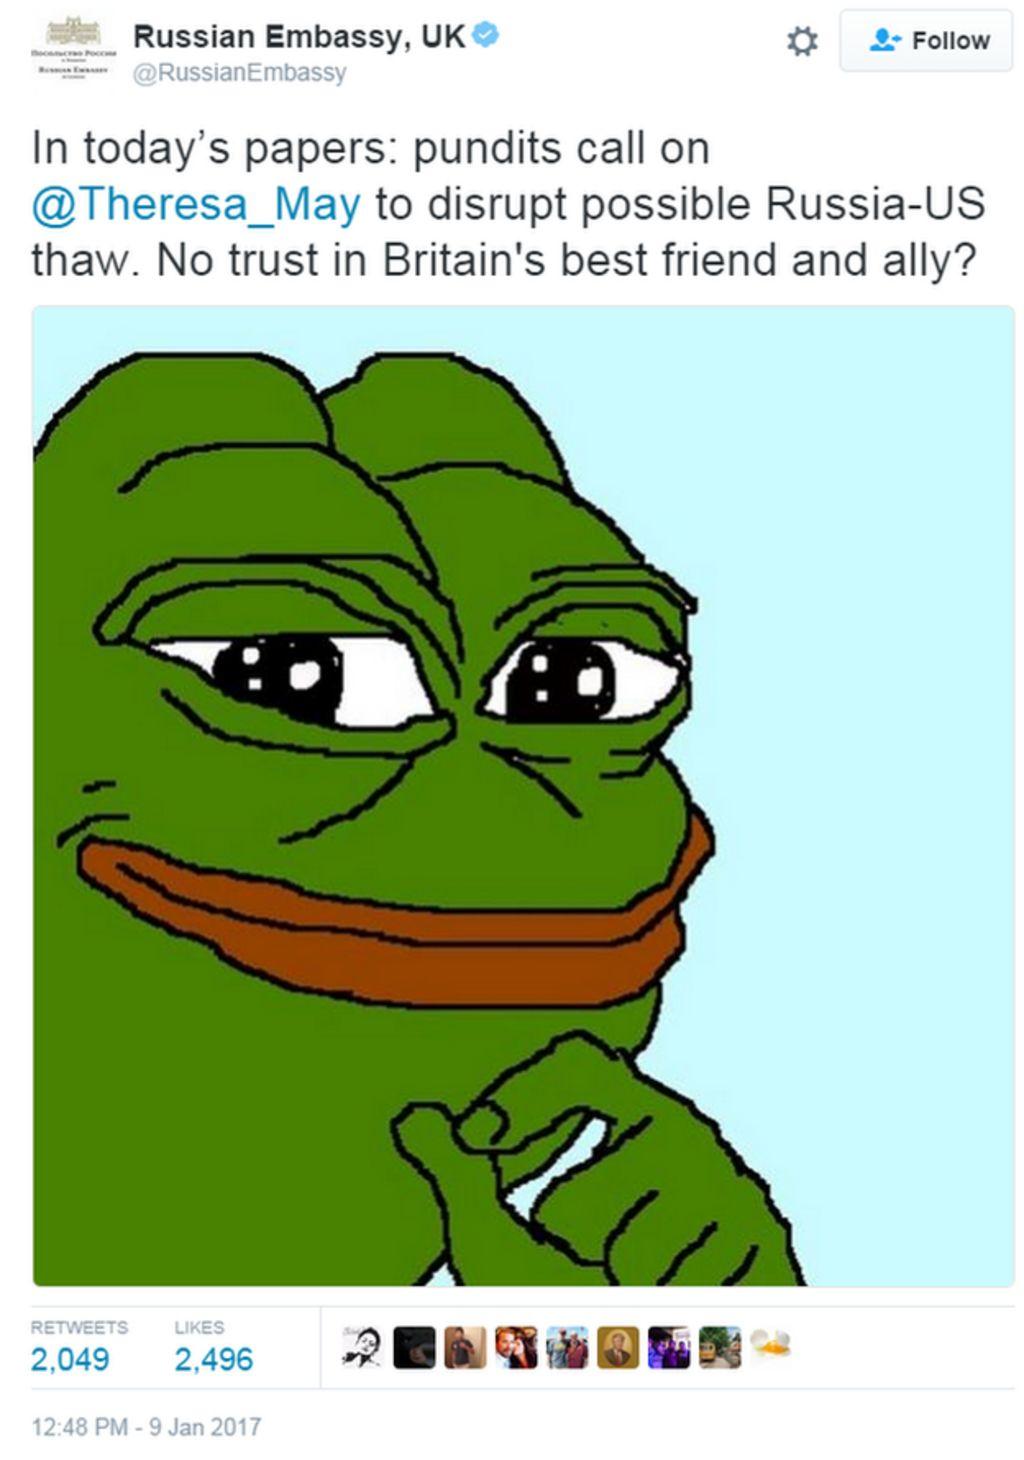 russia taunts british pm with cartoon frog tweet bbc news